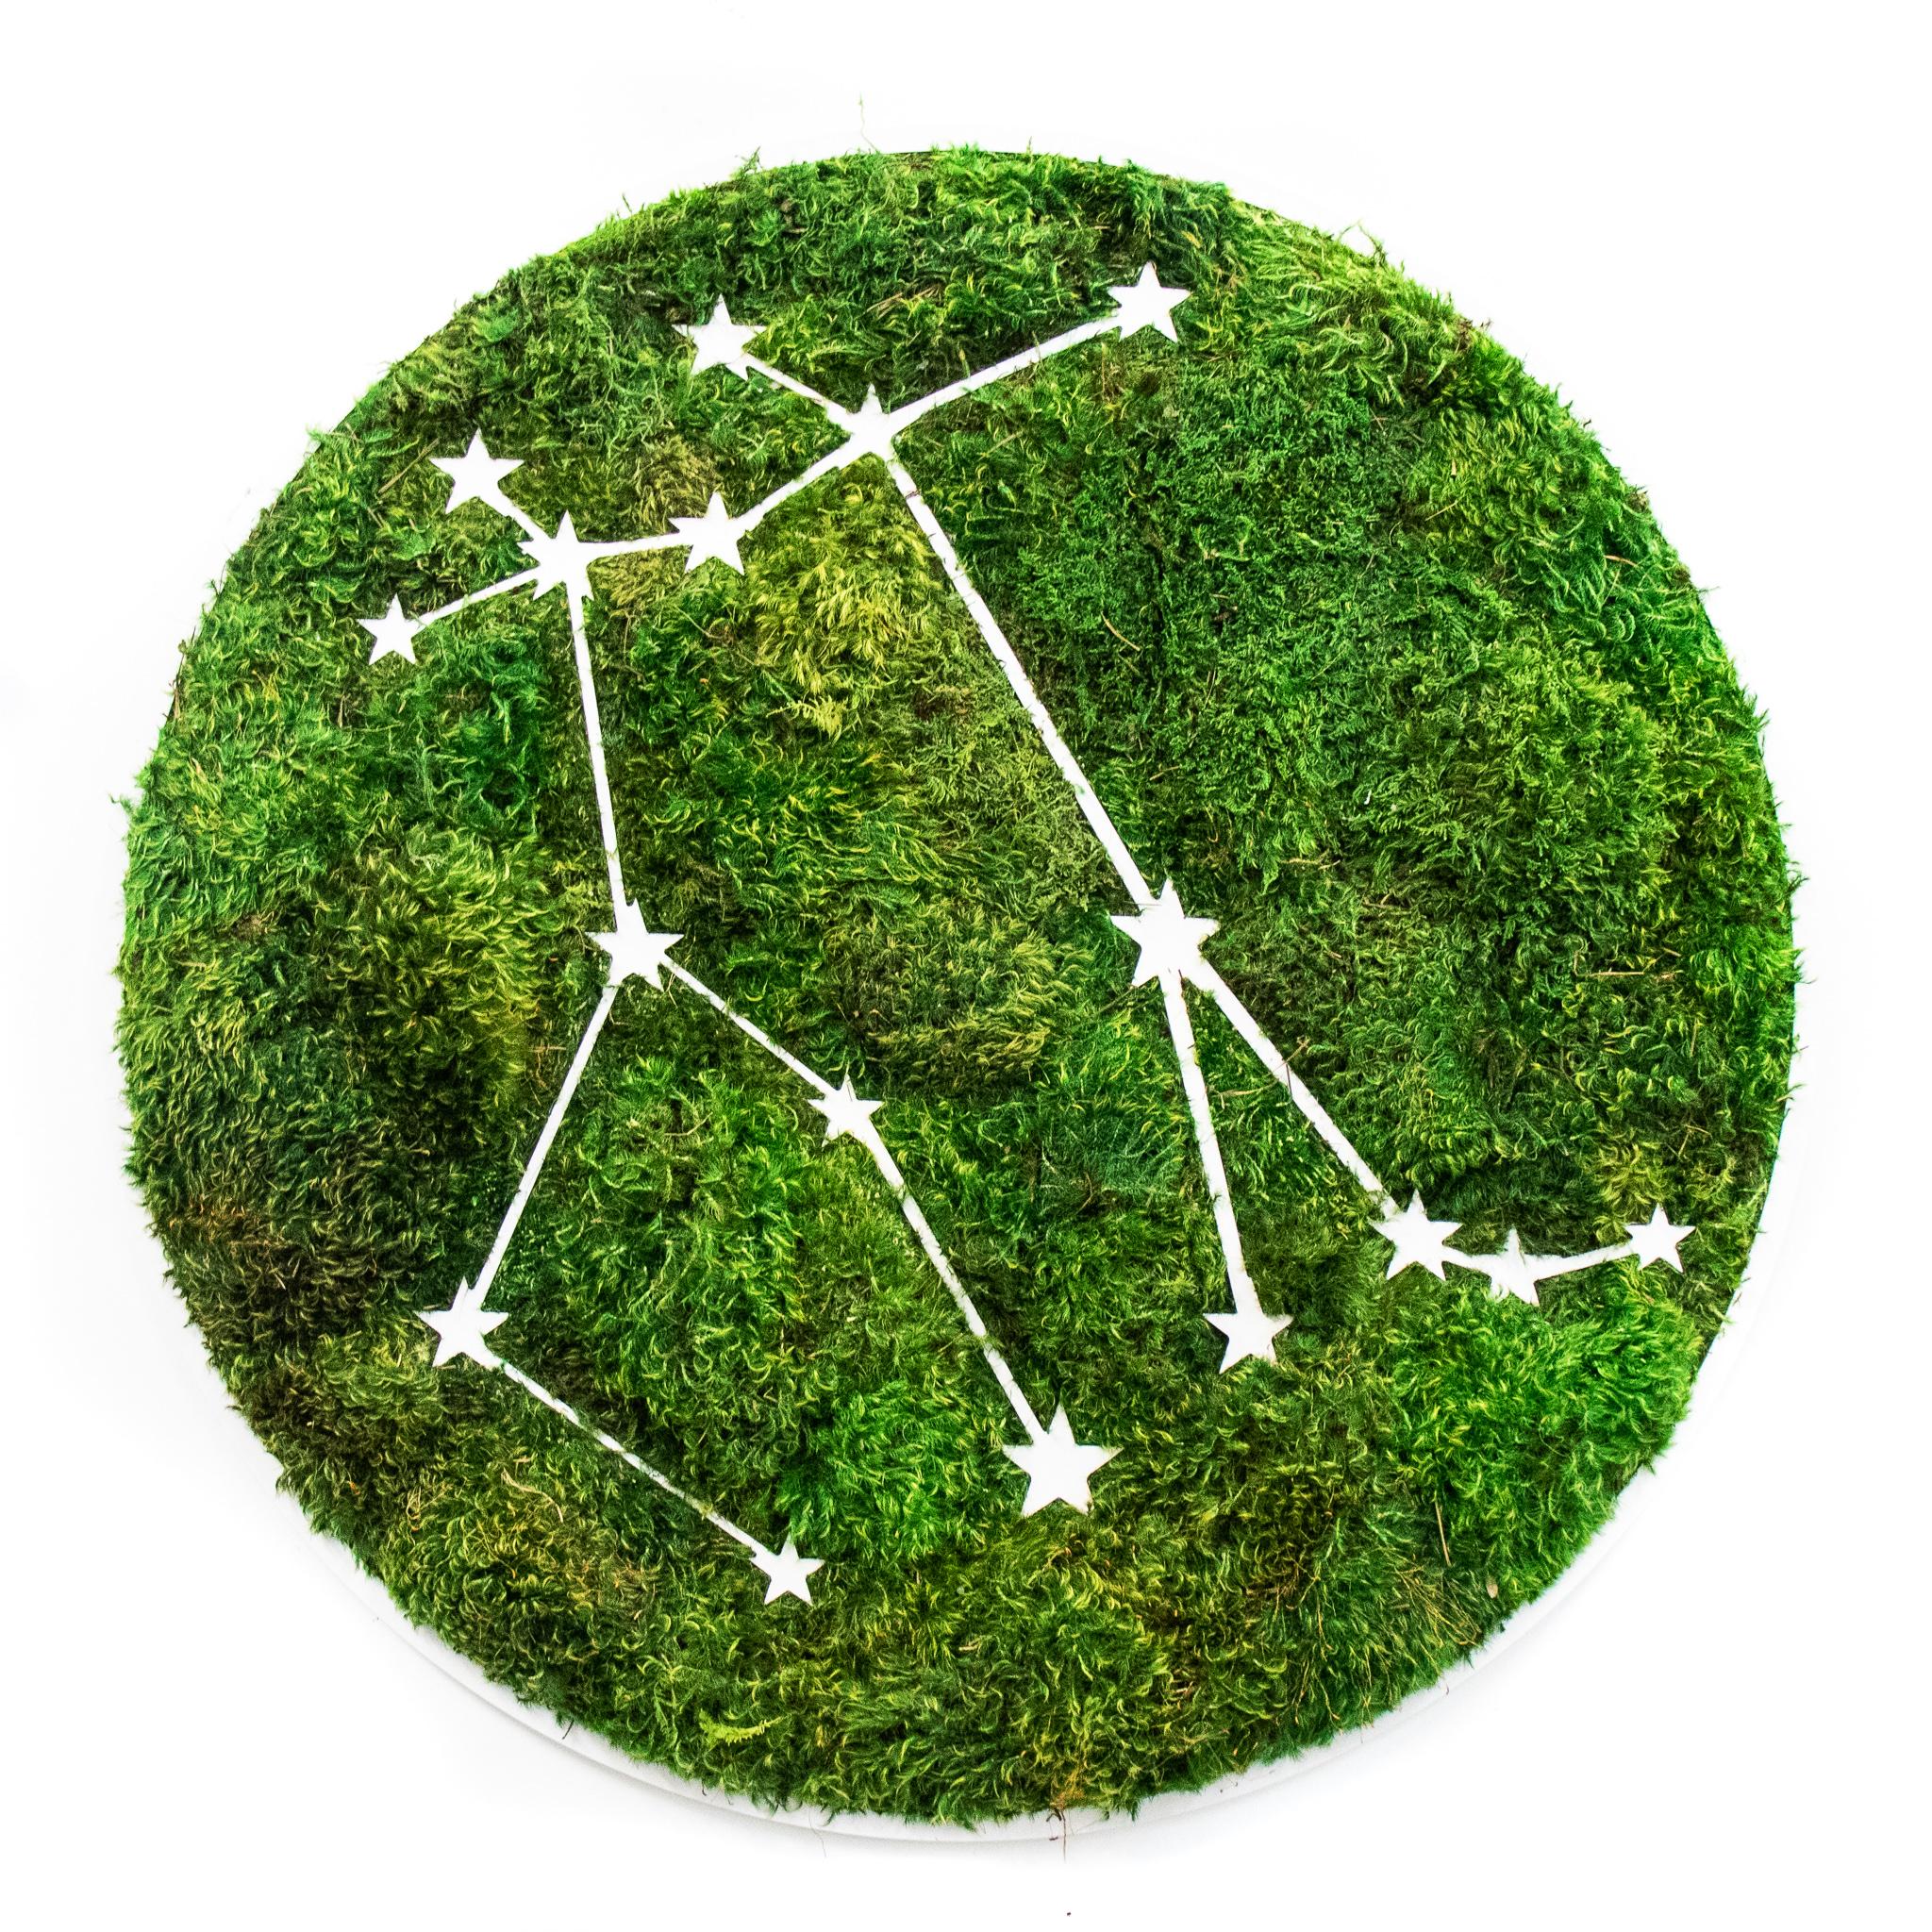 "Gemini Constellation - Moss Wall Art (30"" Diameter)"